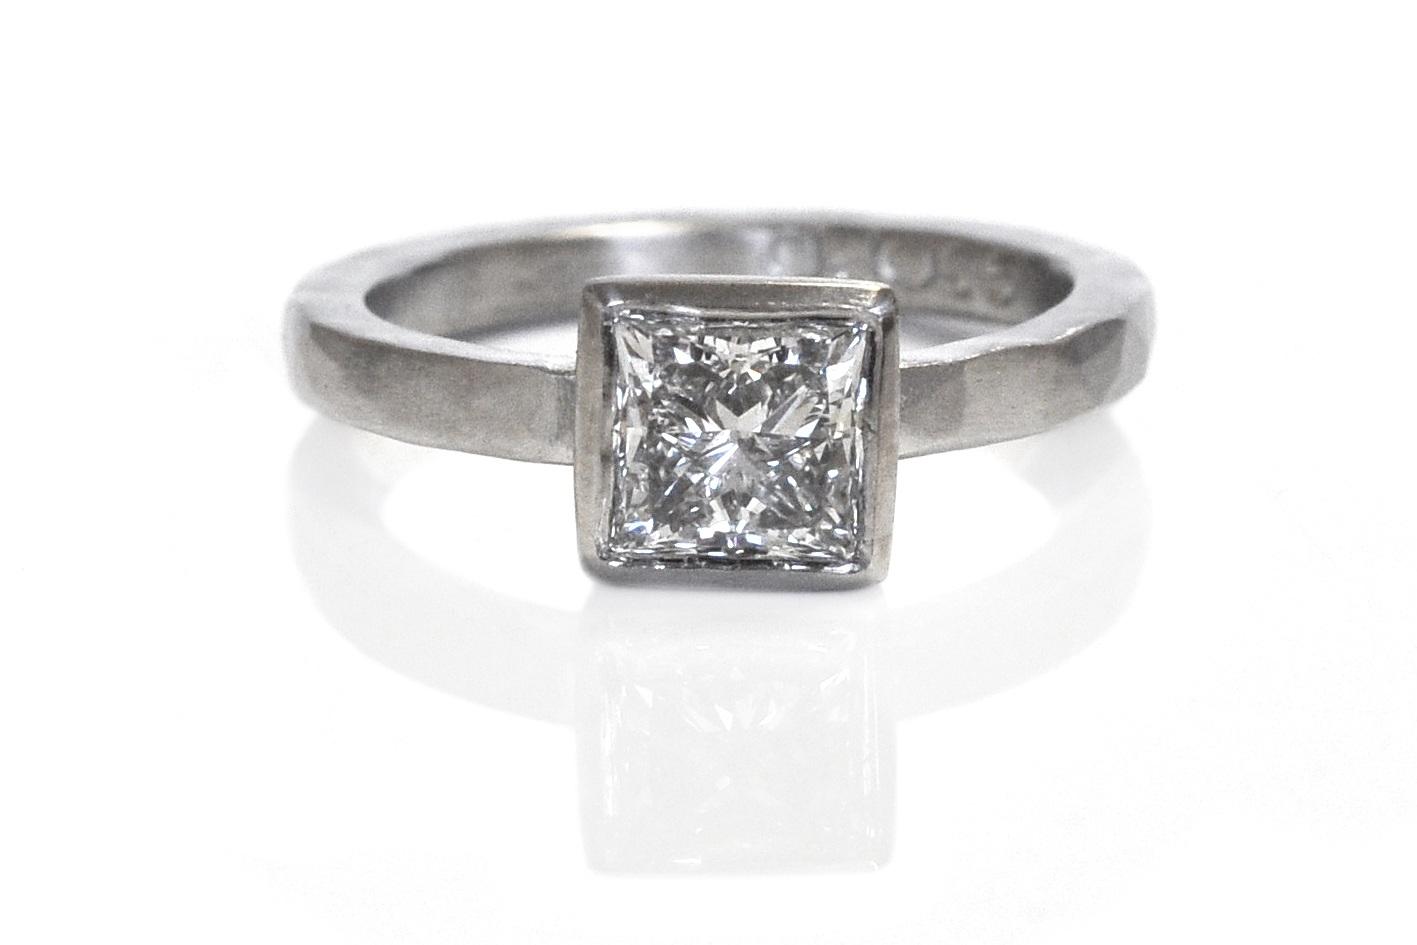 A sparkling princess cut diamond bezel set in hammered 950 palladium.